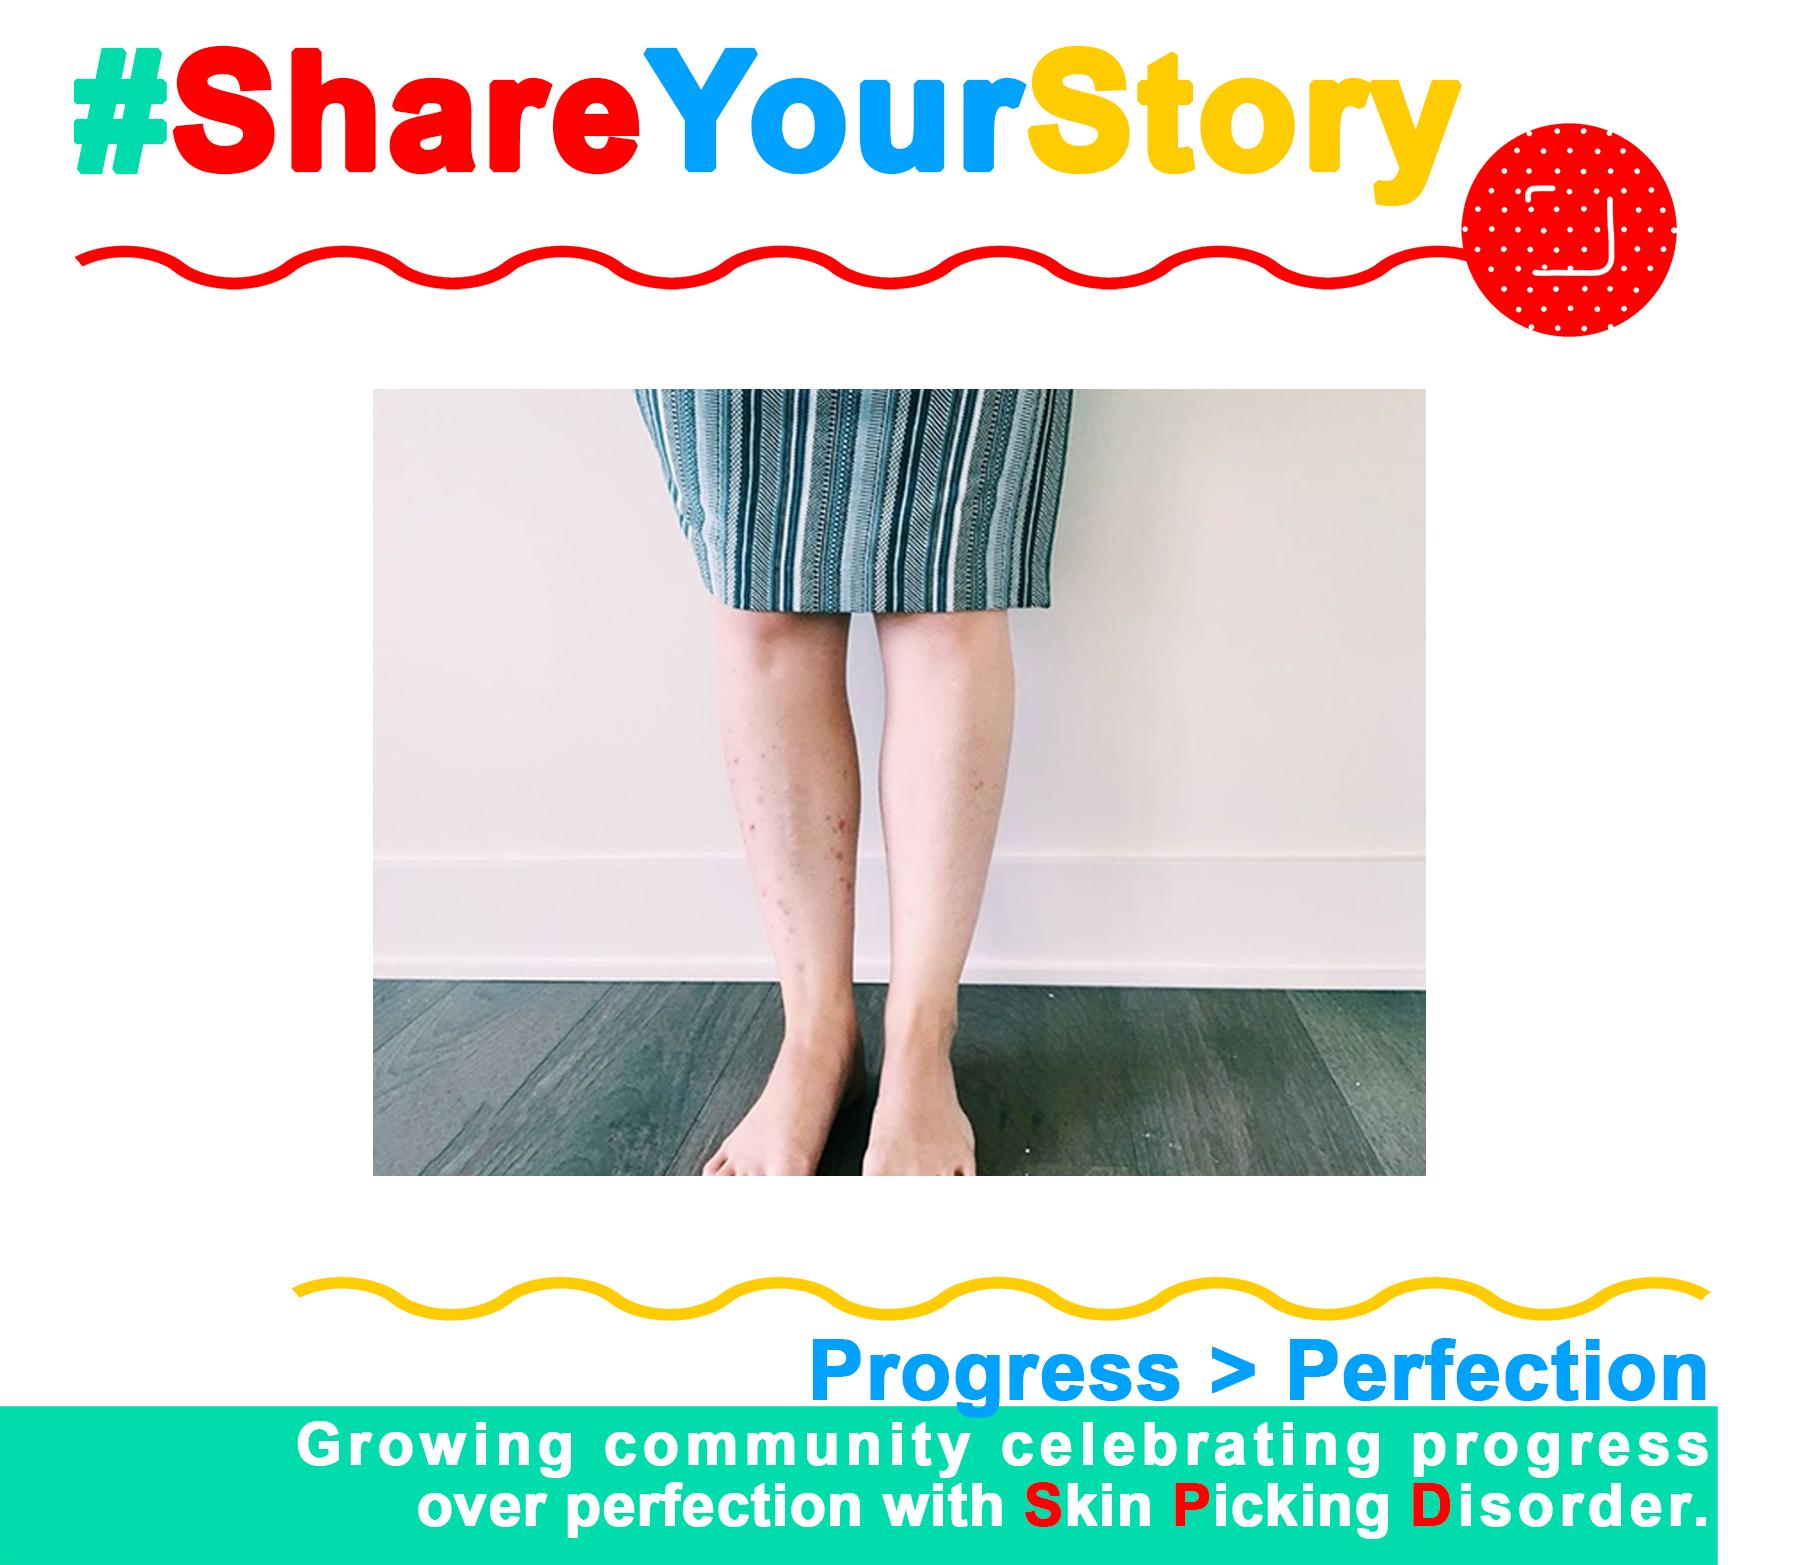 #ShareYourStory